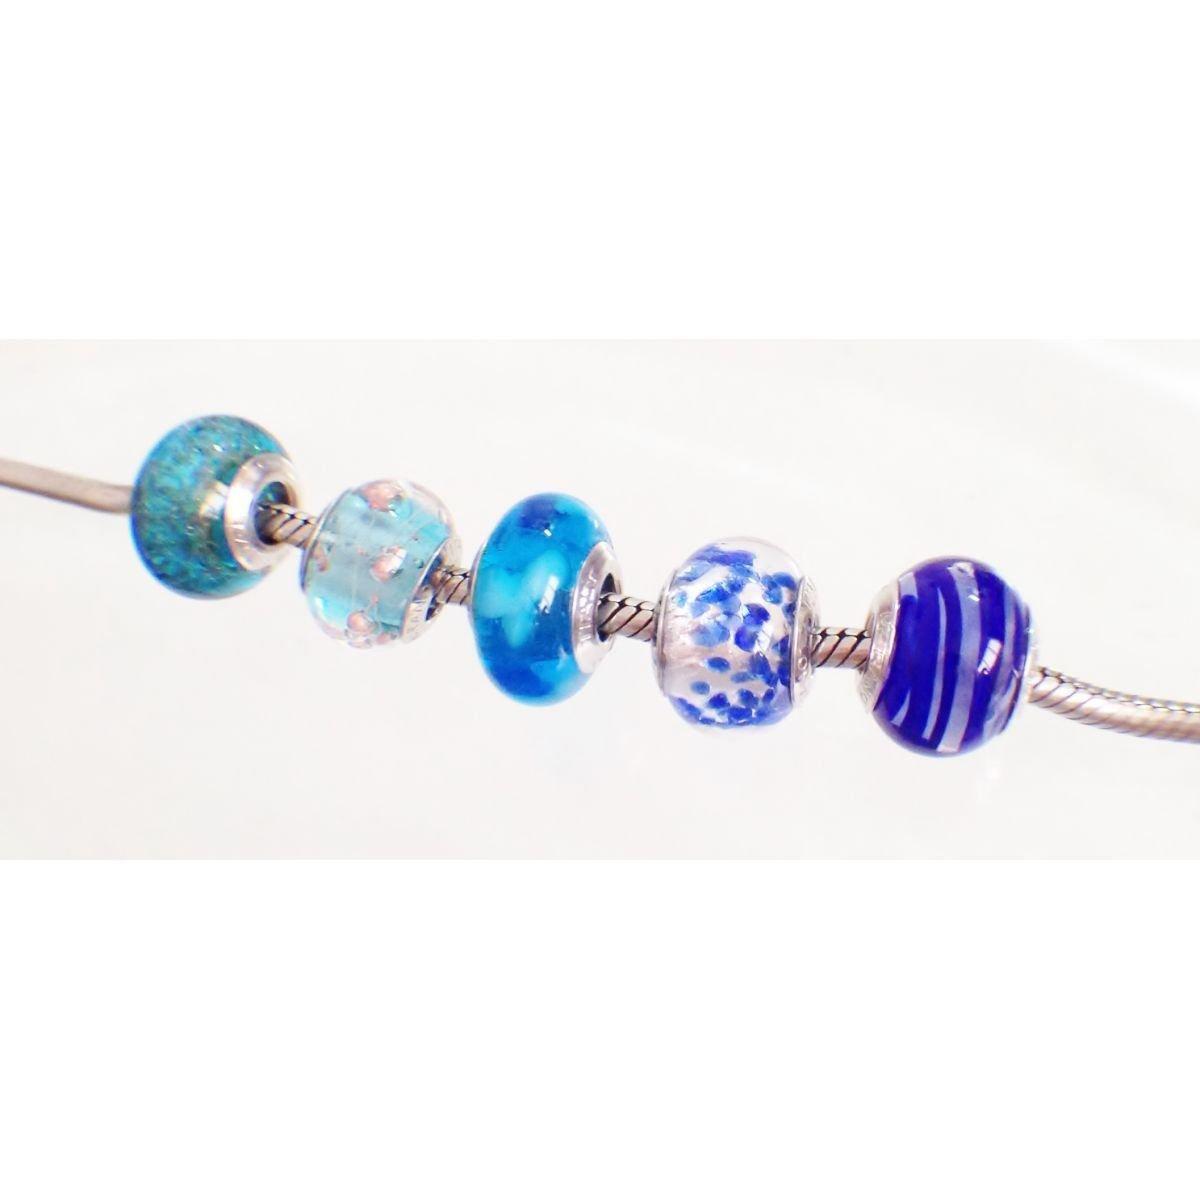 Berloque Murano Azul Pétalas Brancas